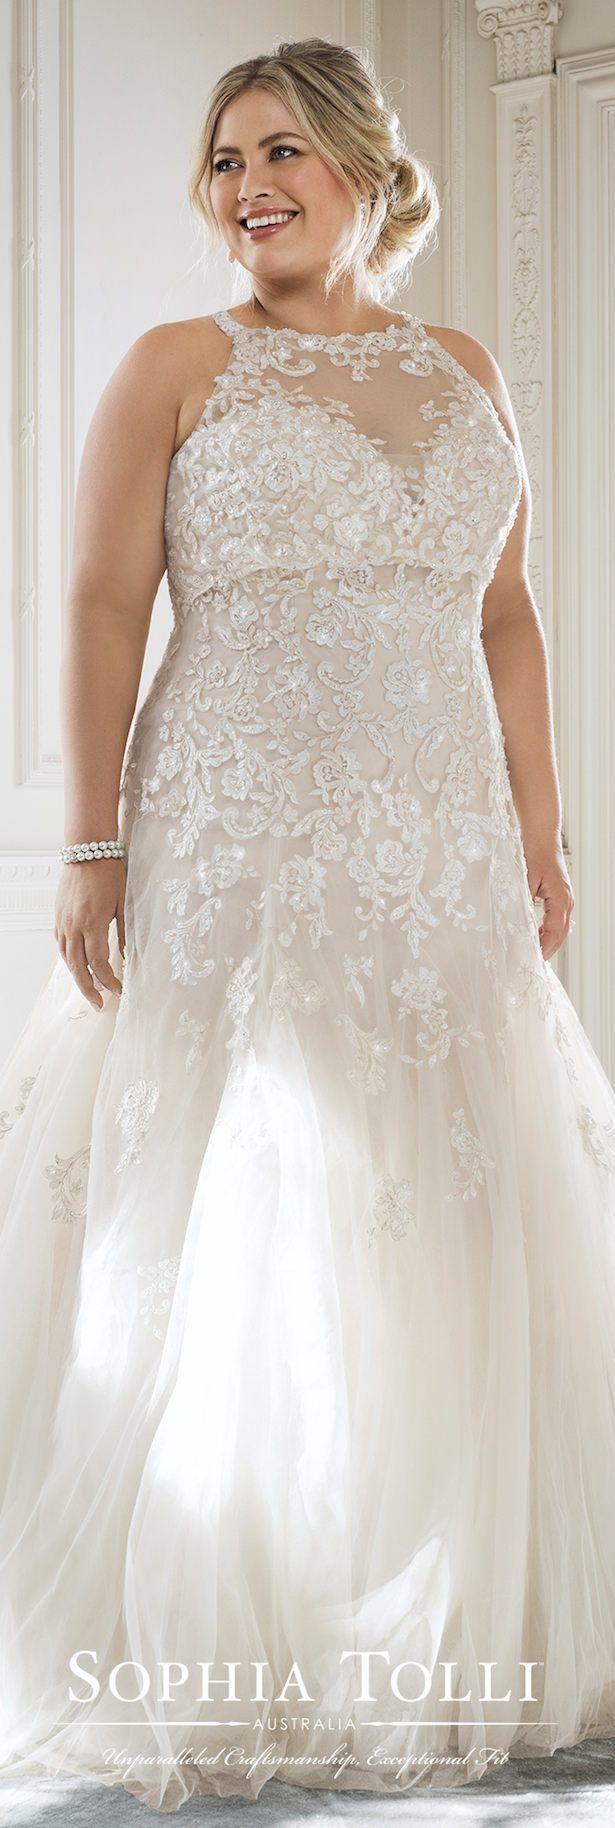 Boho wedding dress plus size  Plus Size Perfection from Sophia Tolli  Brautkleider Plus Size